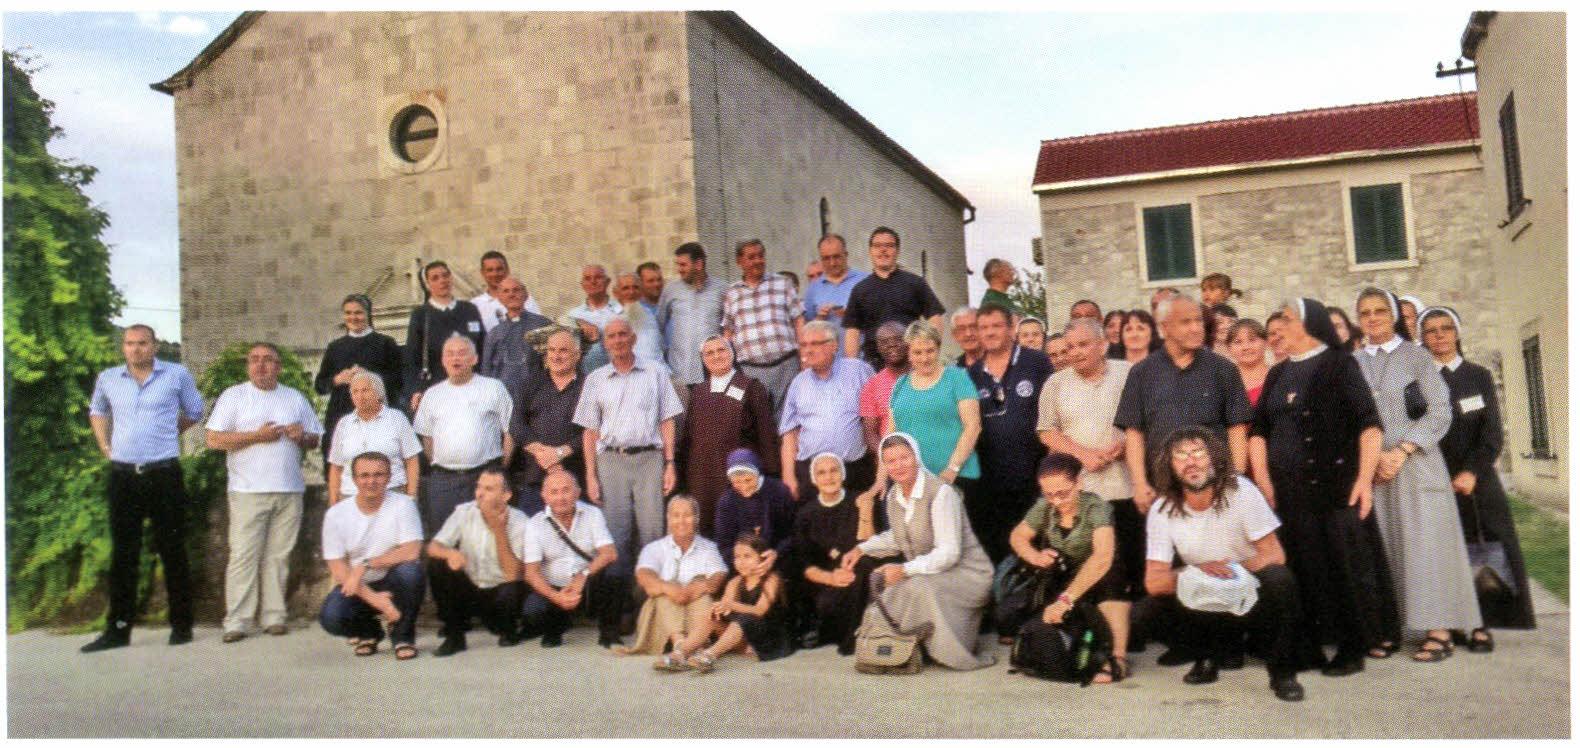 Susret misionara u Dubrovniku 2016.